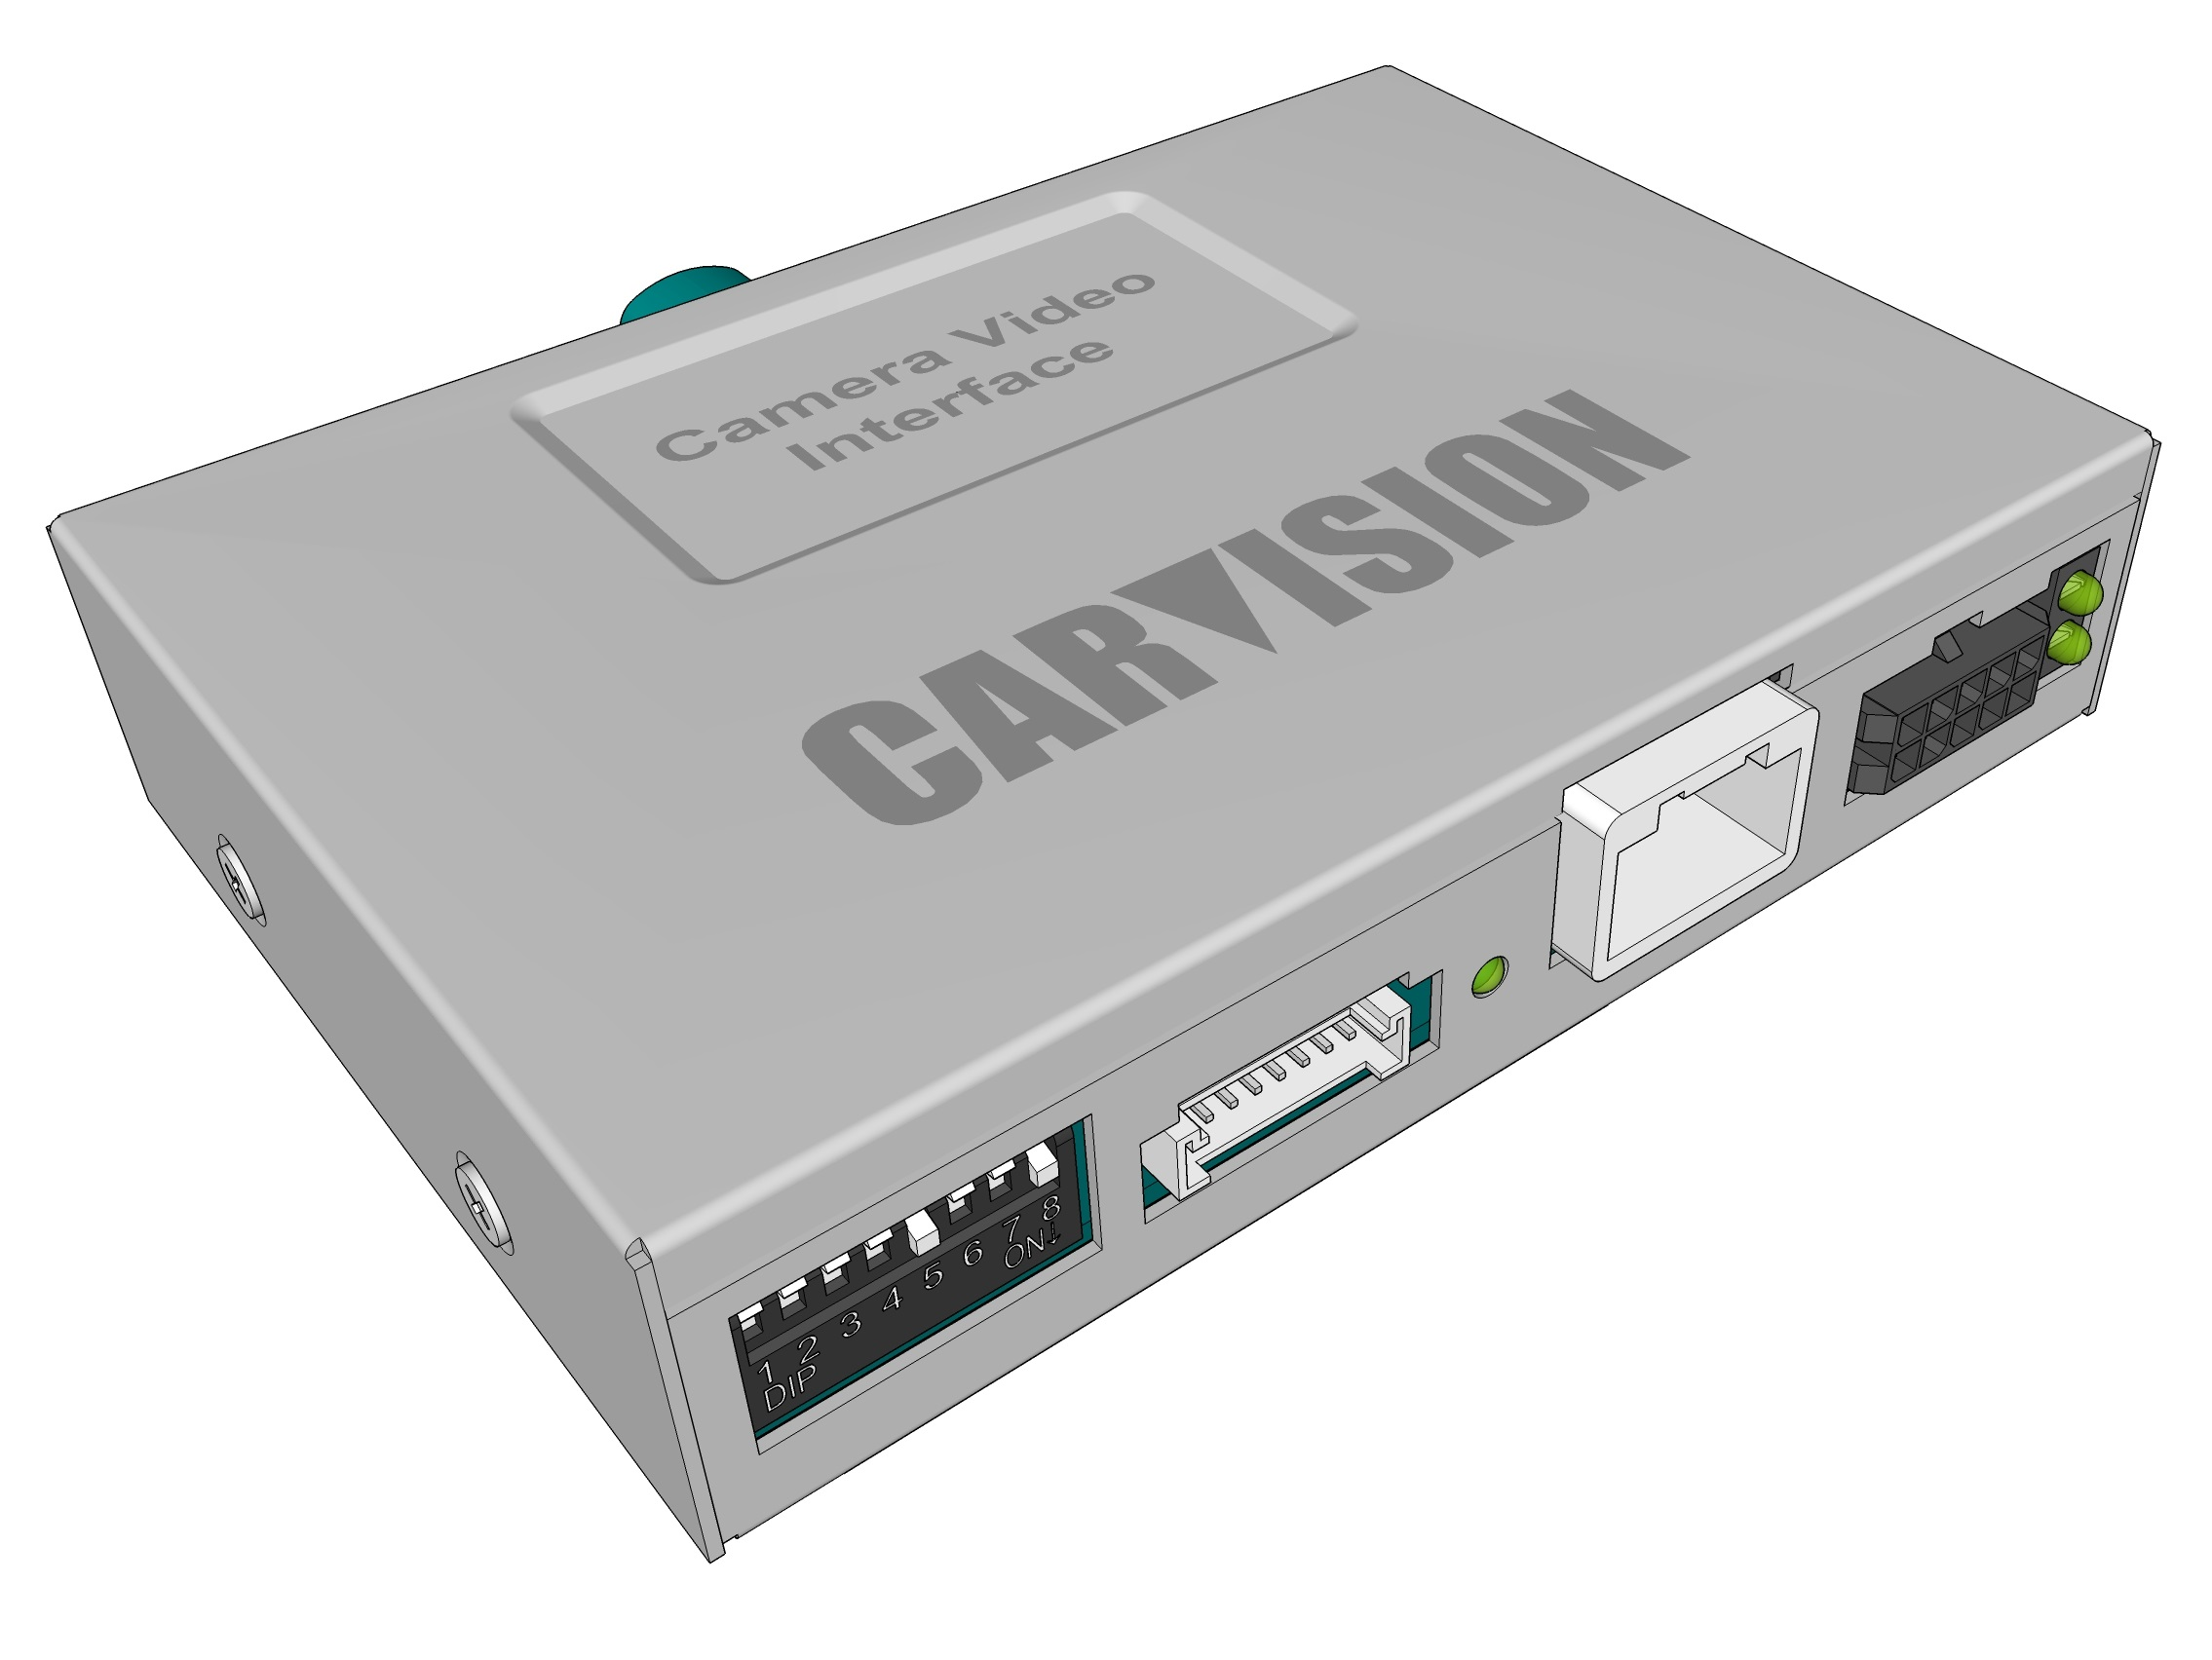 Peugeot Citroen Smeg Smeg Camera Video Interface Order Online At